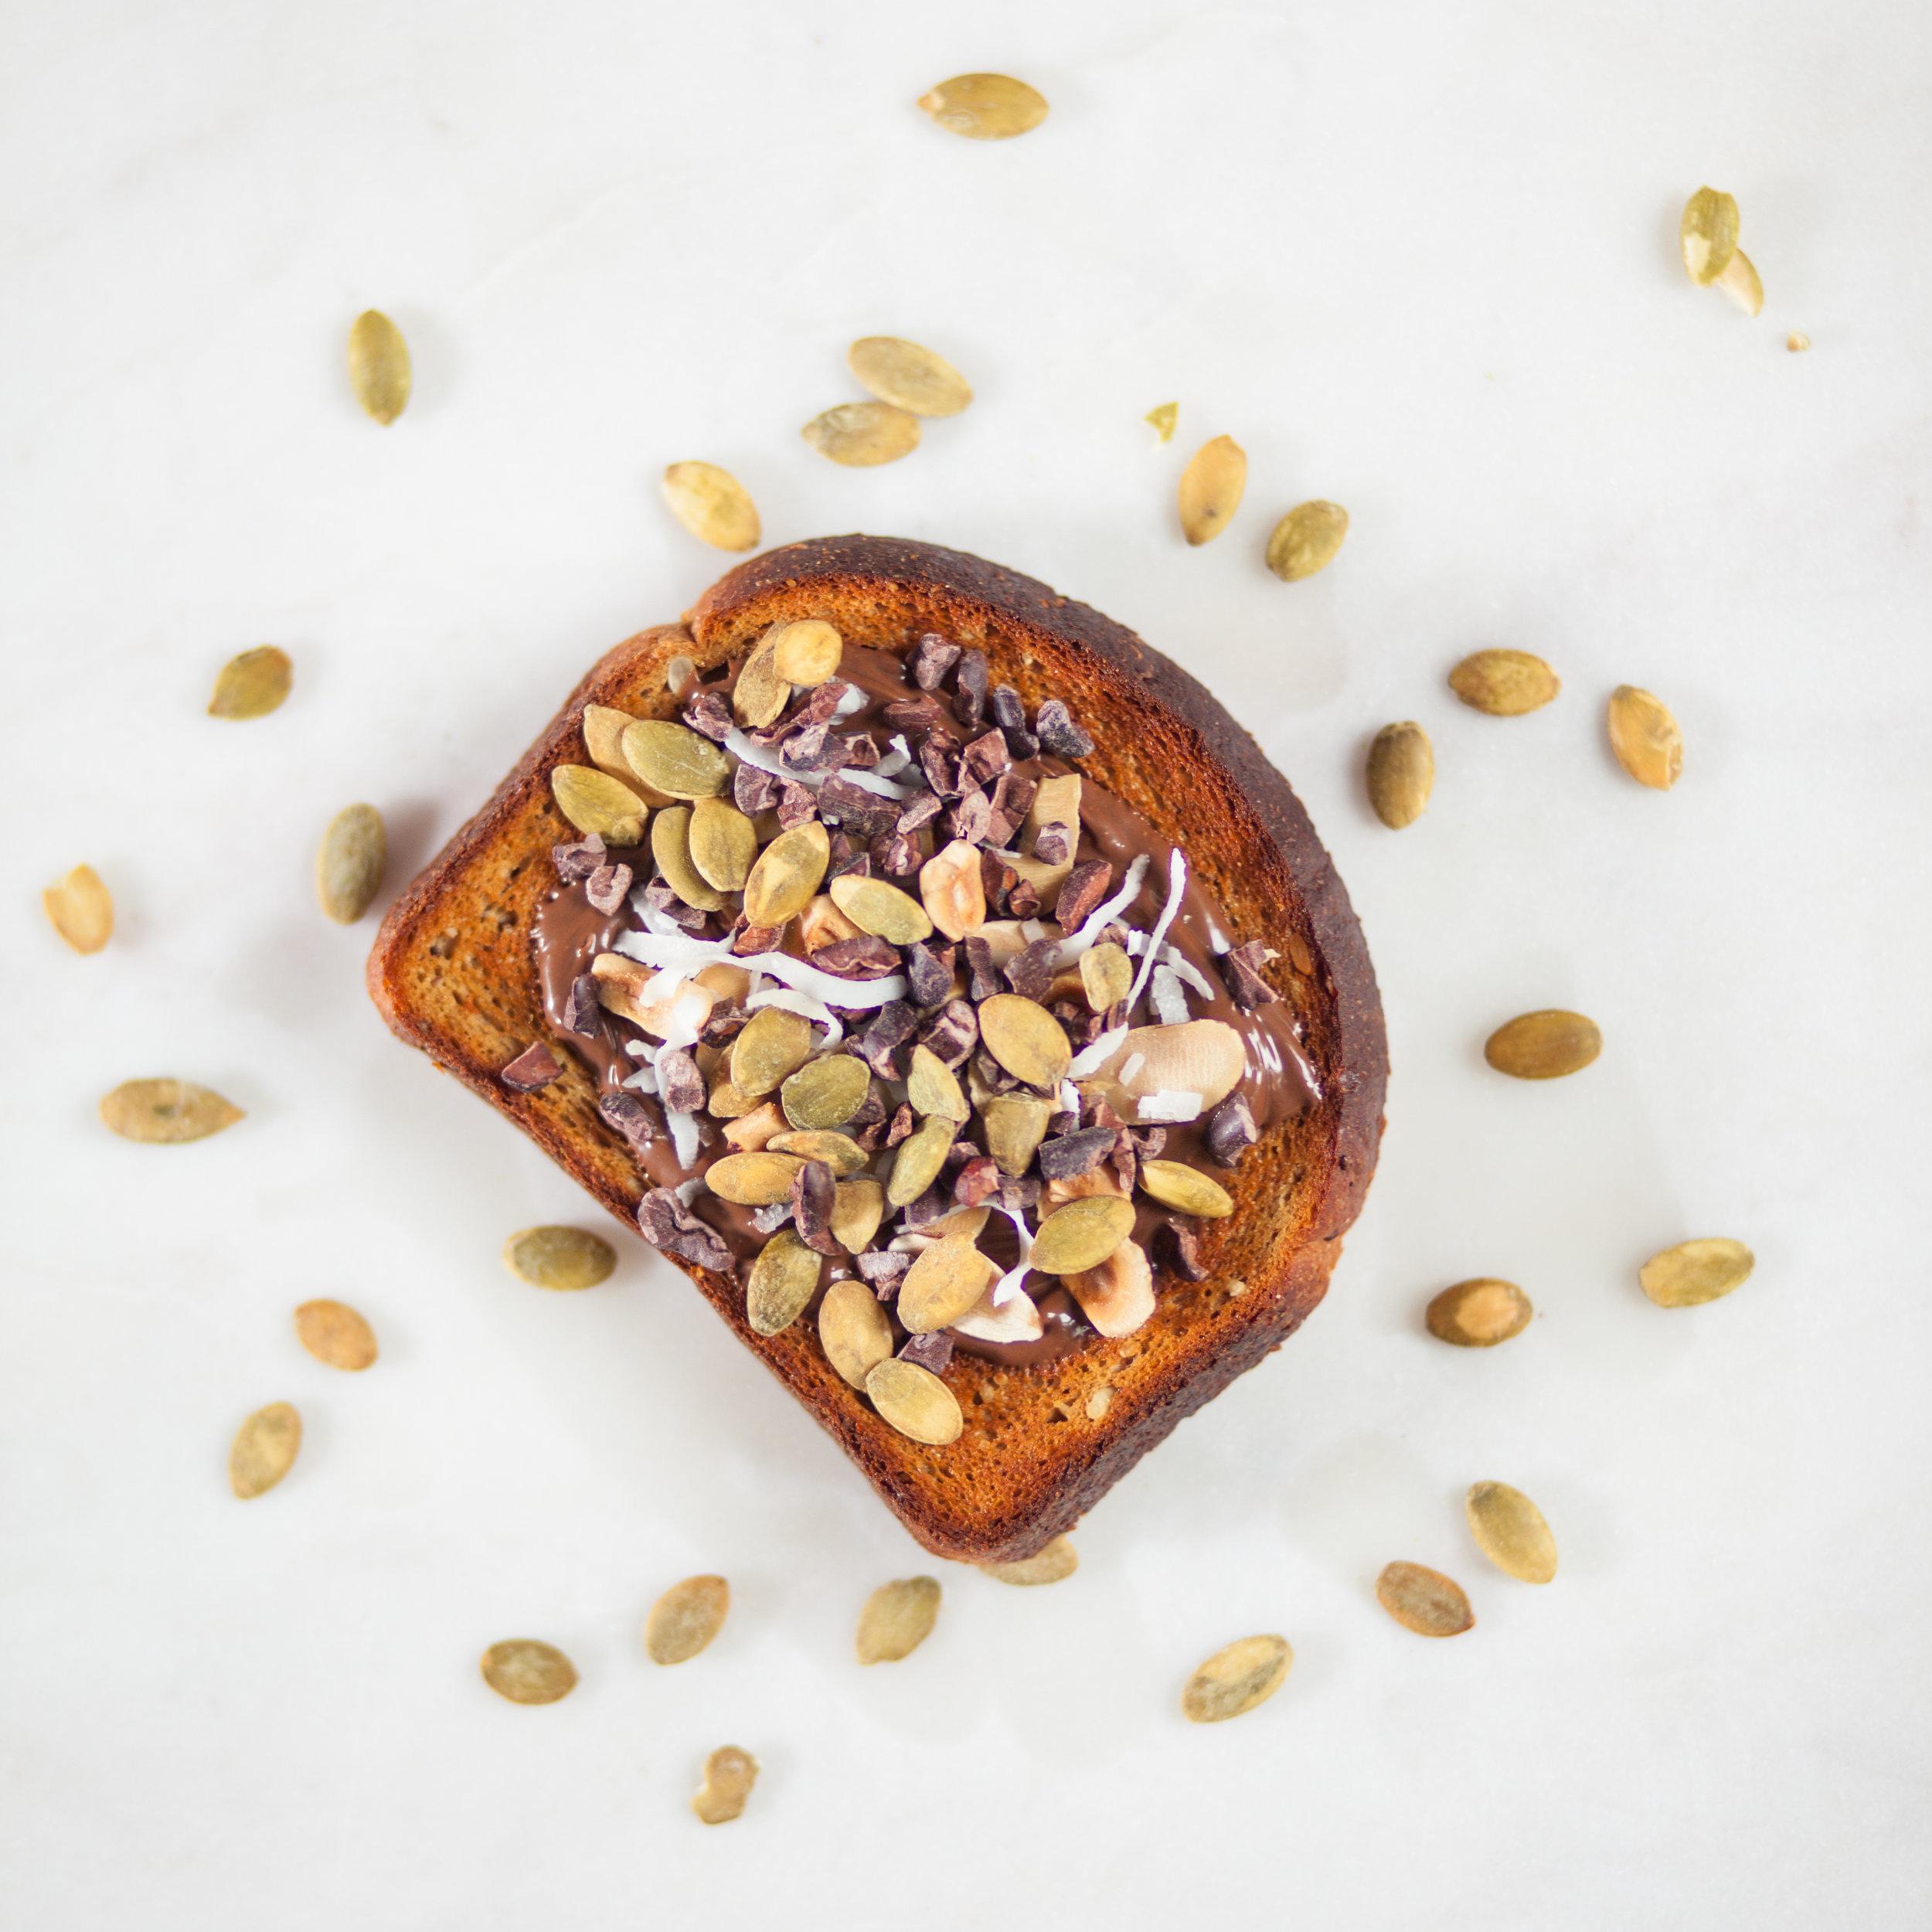 Toast with hazelnut spread, pumpkin seeds and coconut